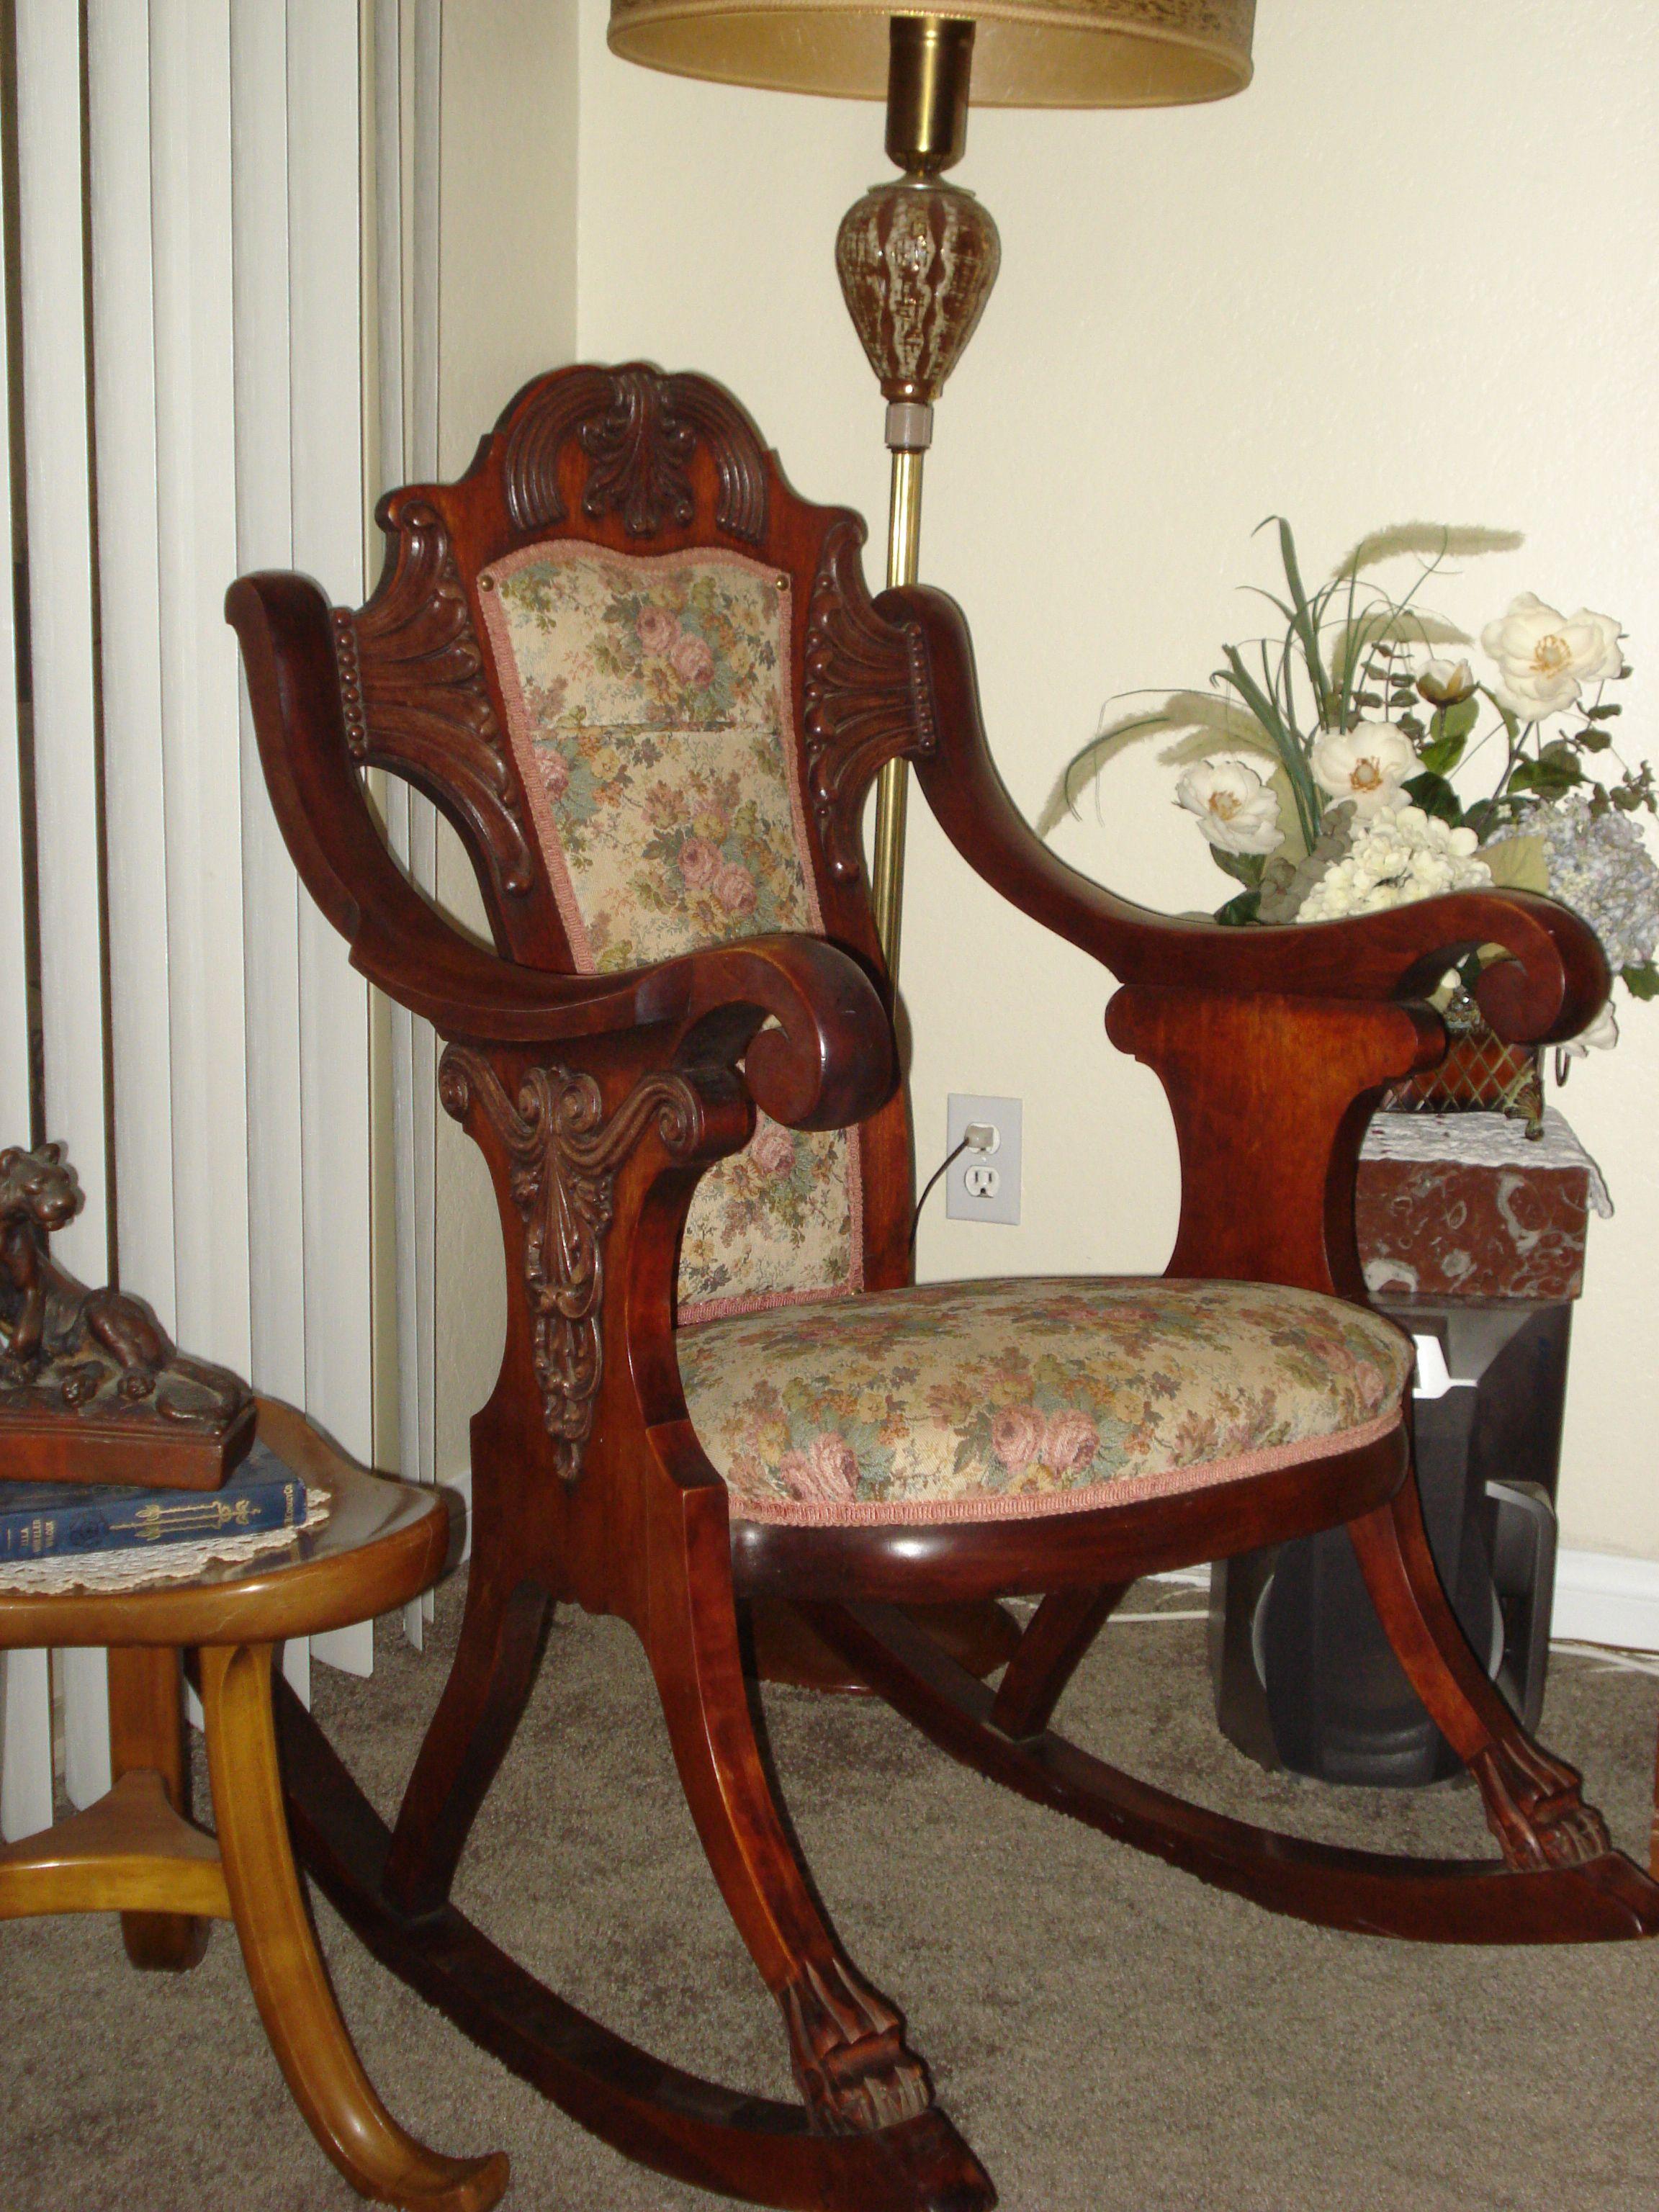 Antique Wooden Rocking Chair Wooden Rocking Chairs Rocking